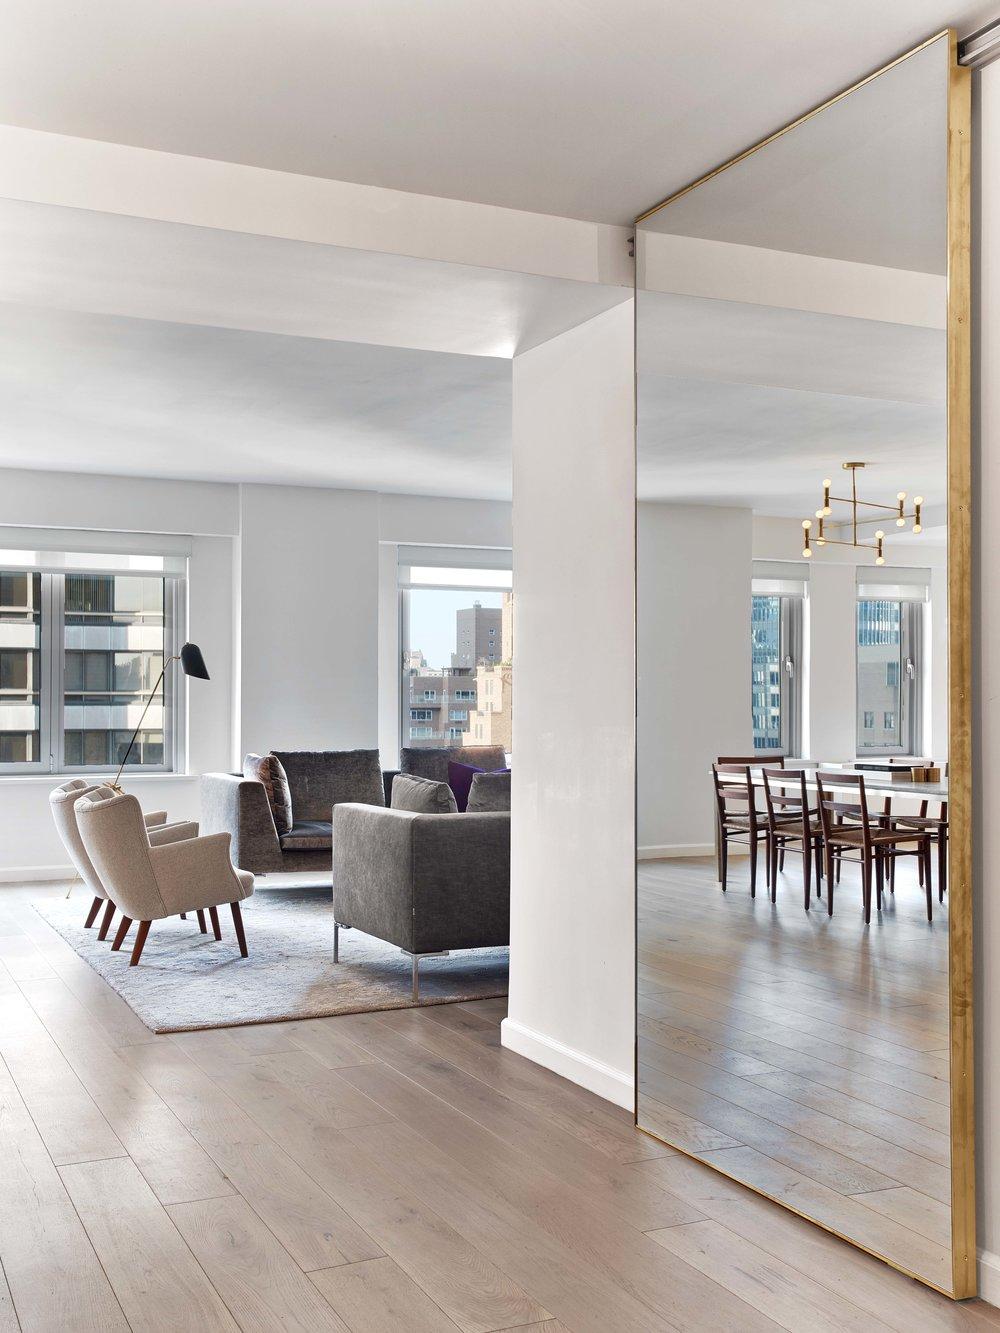 Mirror Installation 200 E 62nd Street Condominiums Messana O Rorke Condominium Interior Design Condominium Interior Condo Interior Design